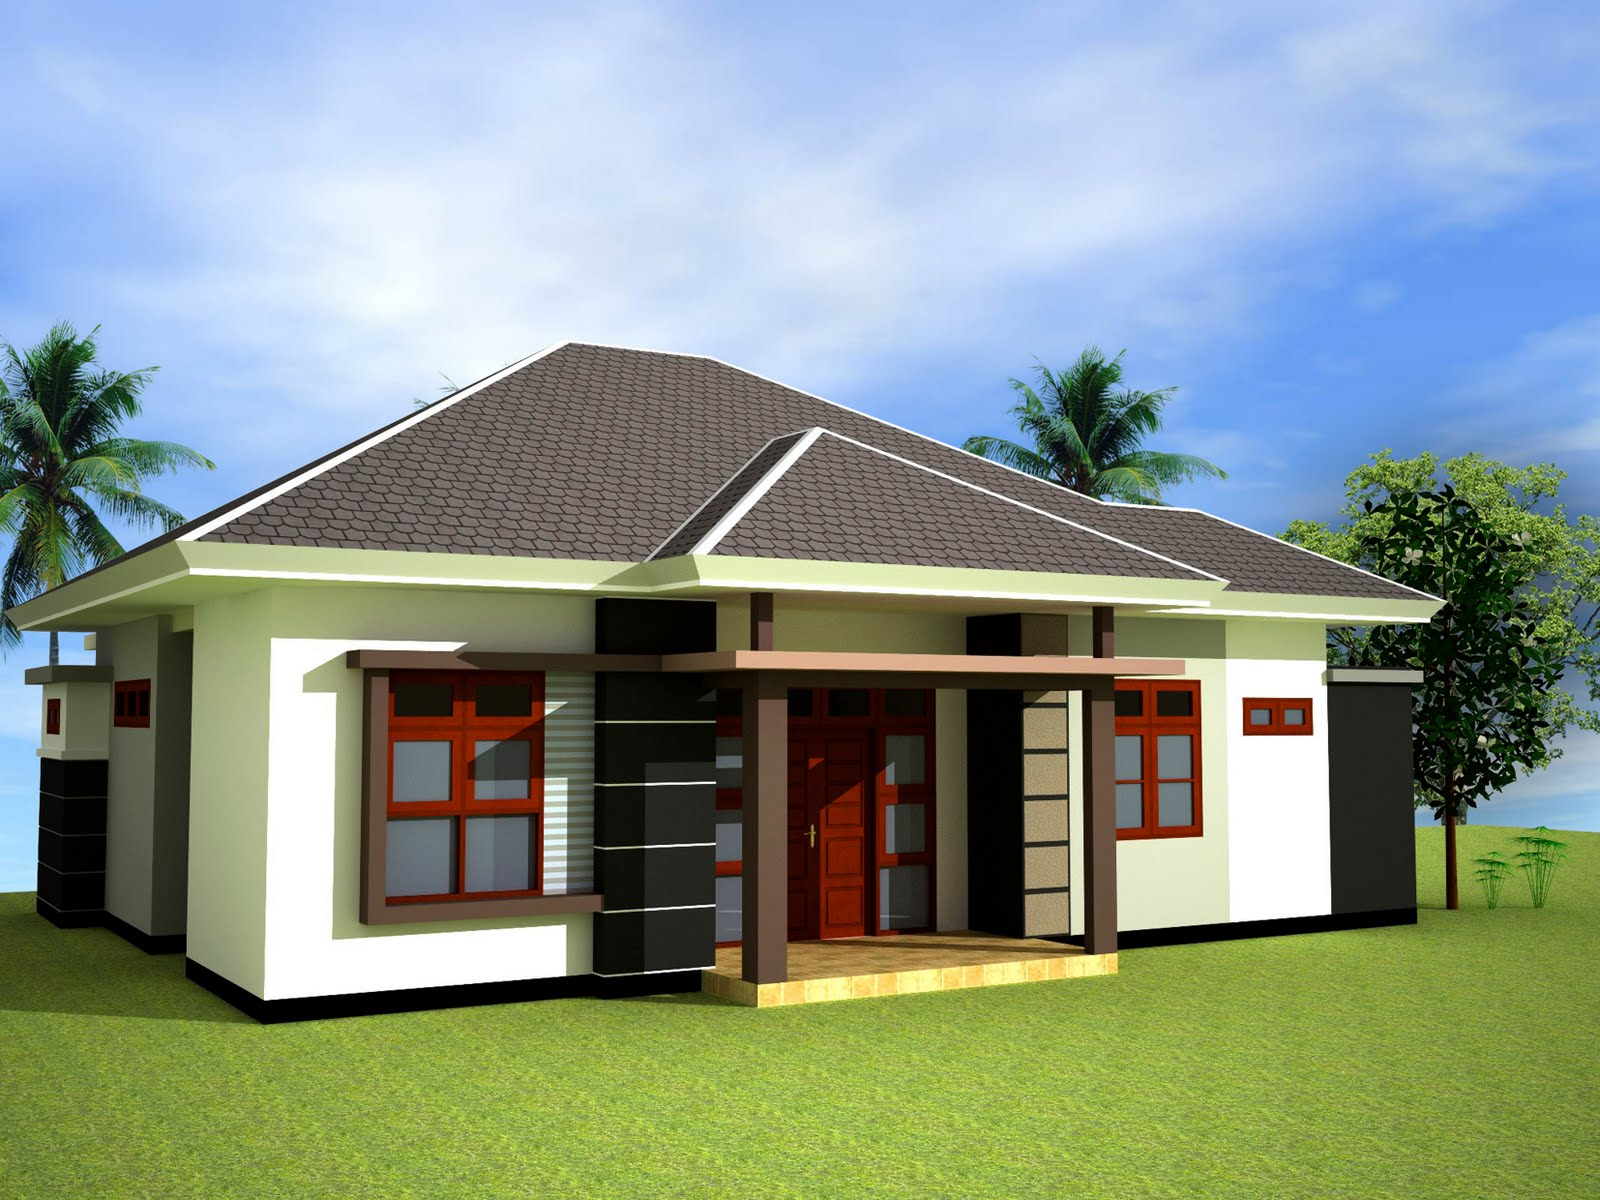 33 Reka Bentuk Rumah Moden Sebagai Inspirasi Untuk Anda Hias My